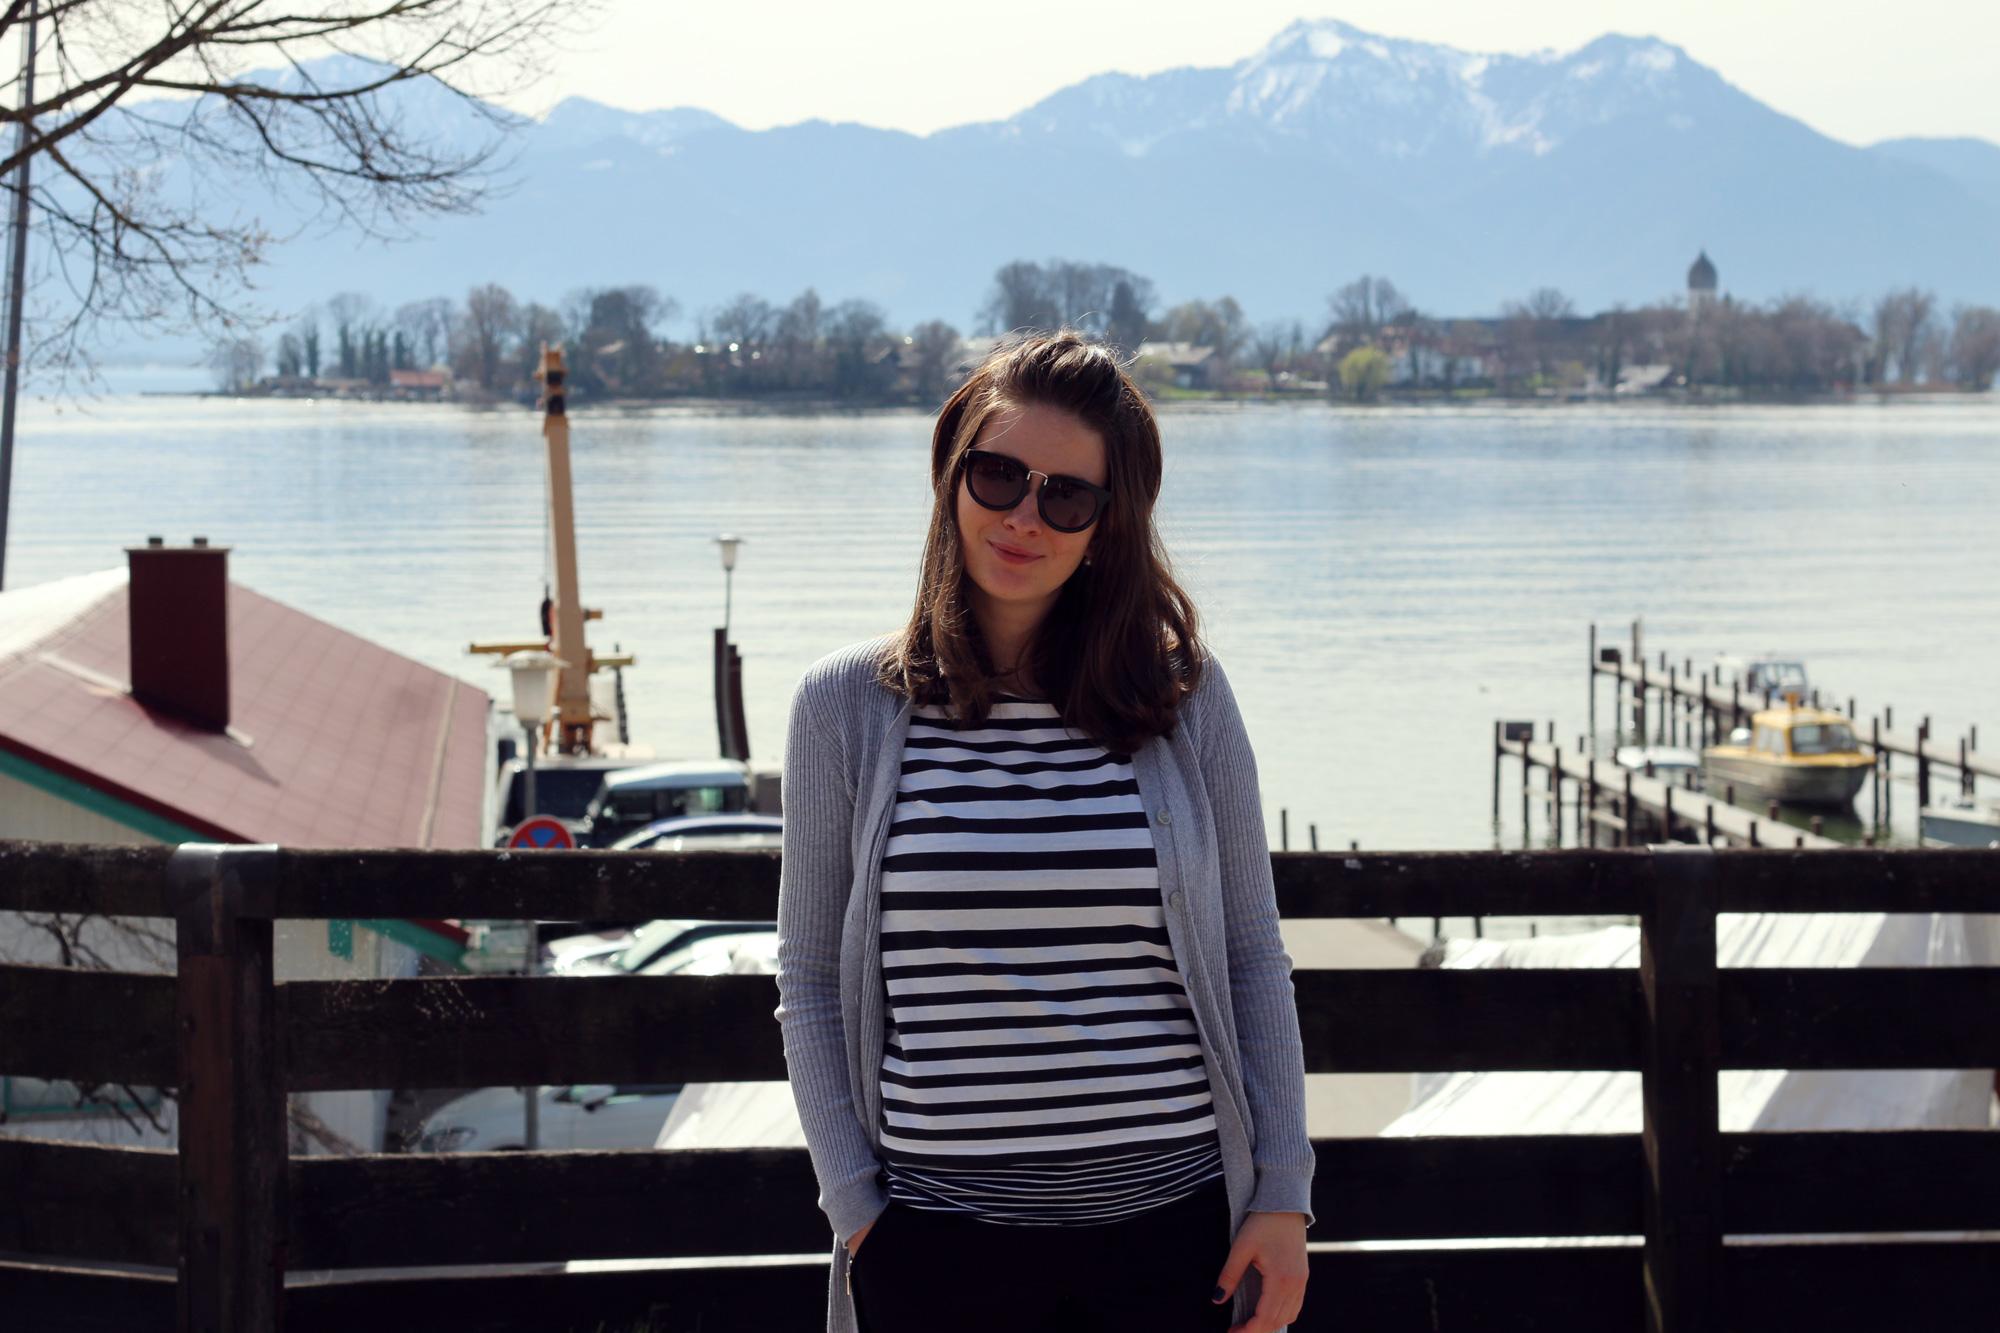 Cheimsee-lake-Bayern-weekend-escape